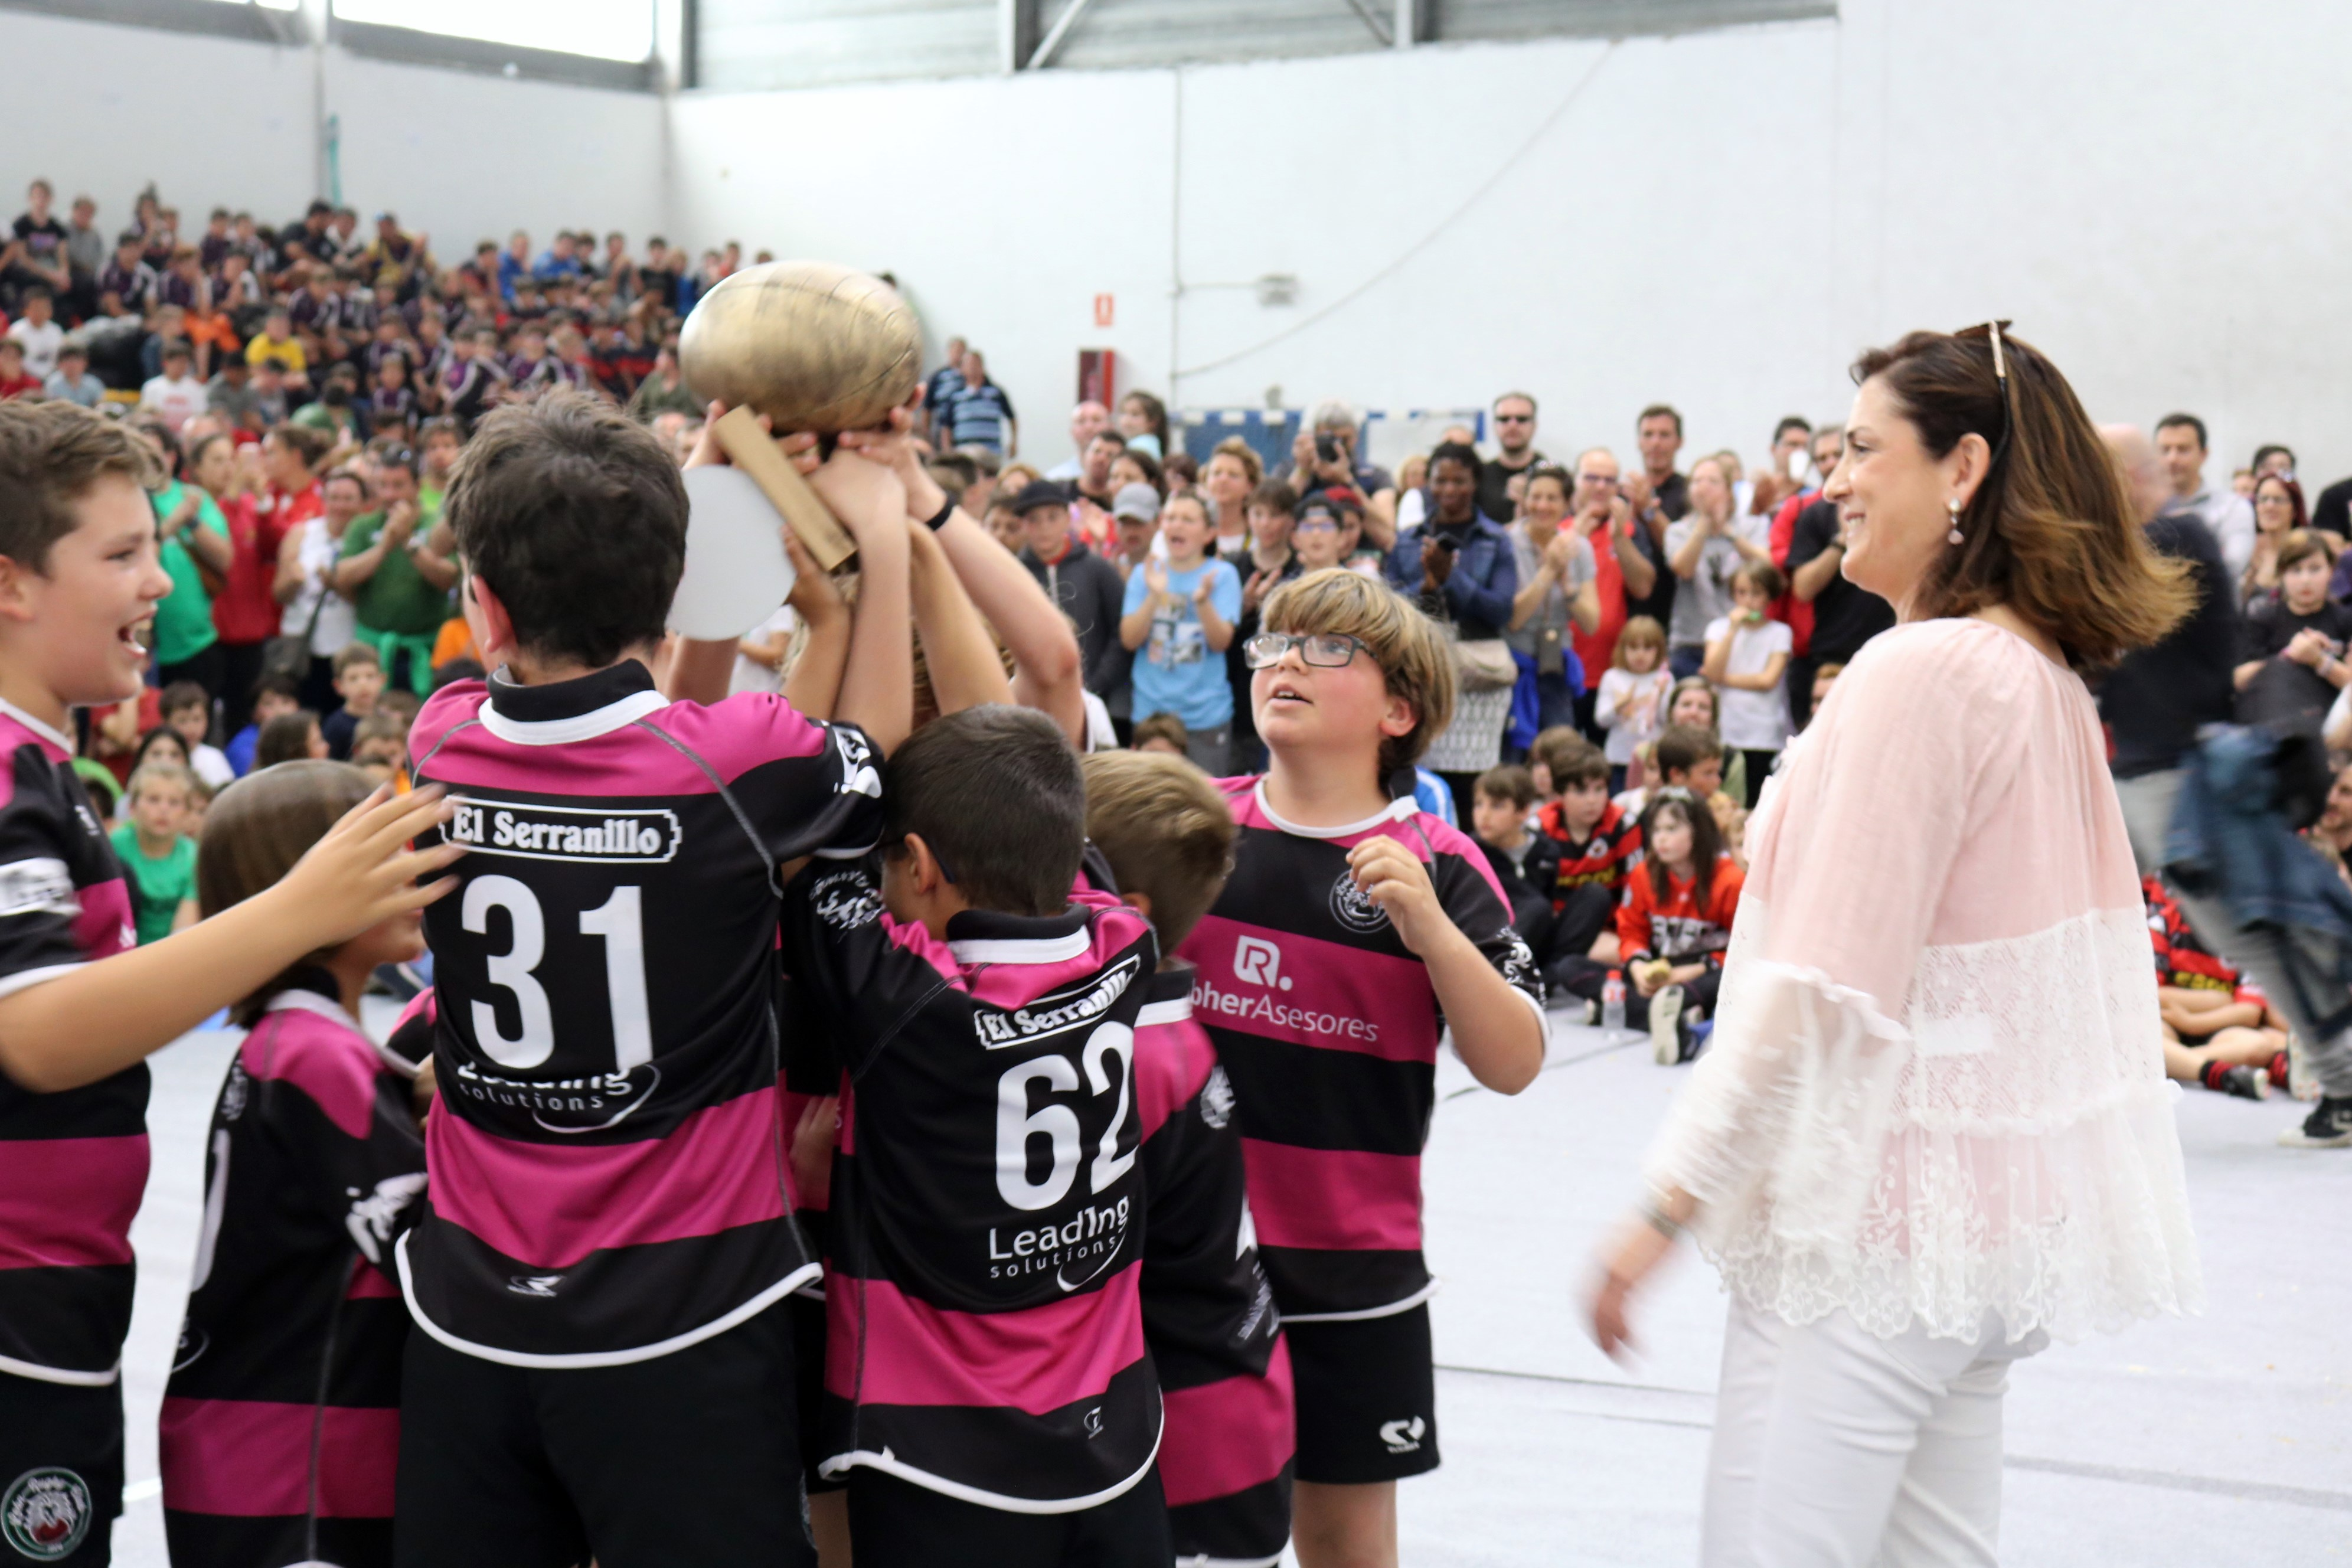 07_05_17_Rugby_ARABA_CUP__85_.JPG